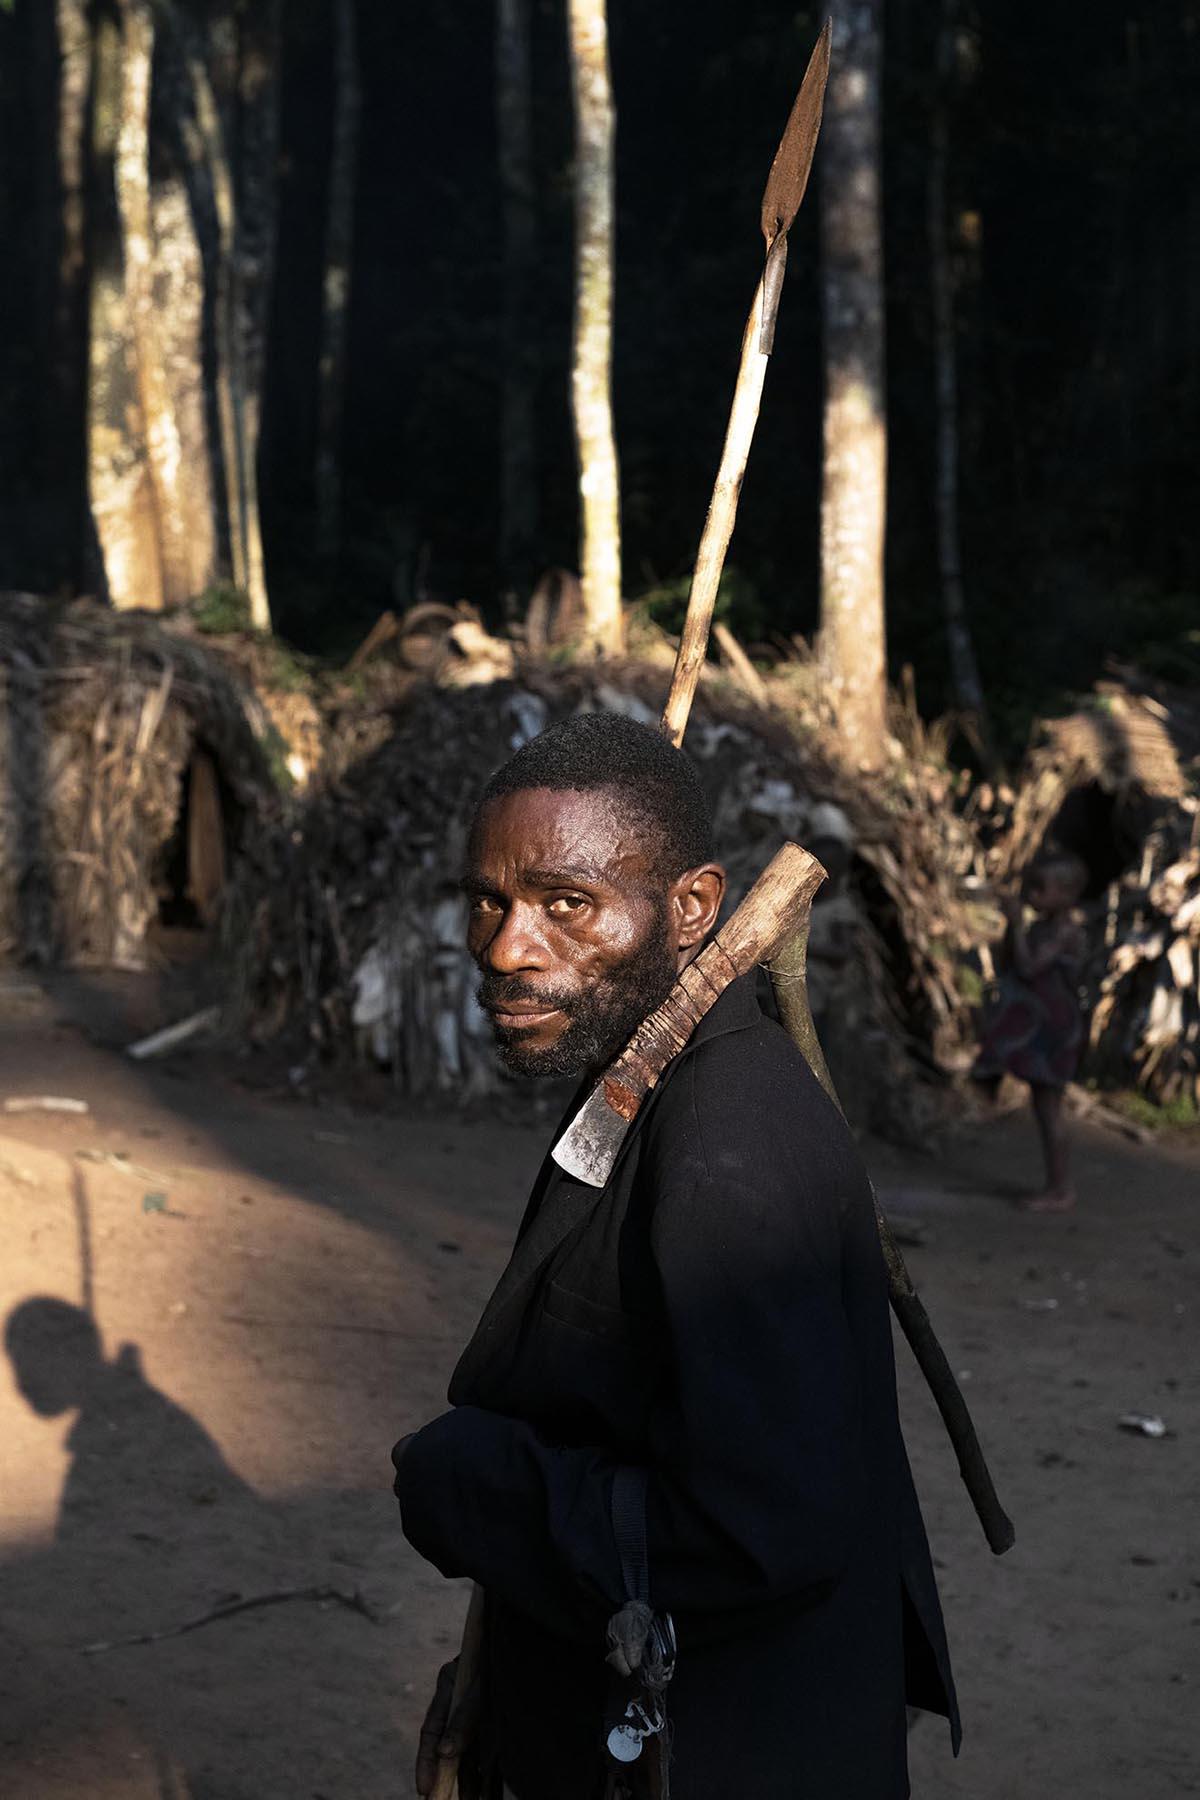 kameroen-baka-pygmeeën-man-tradionele-bijl